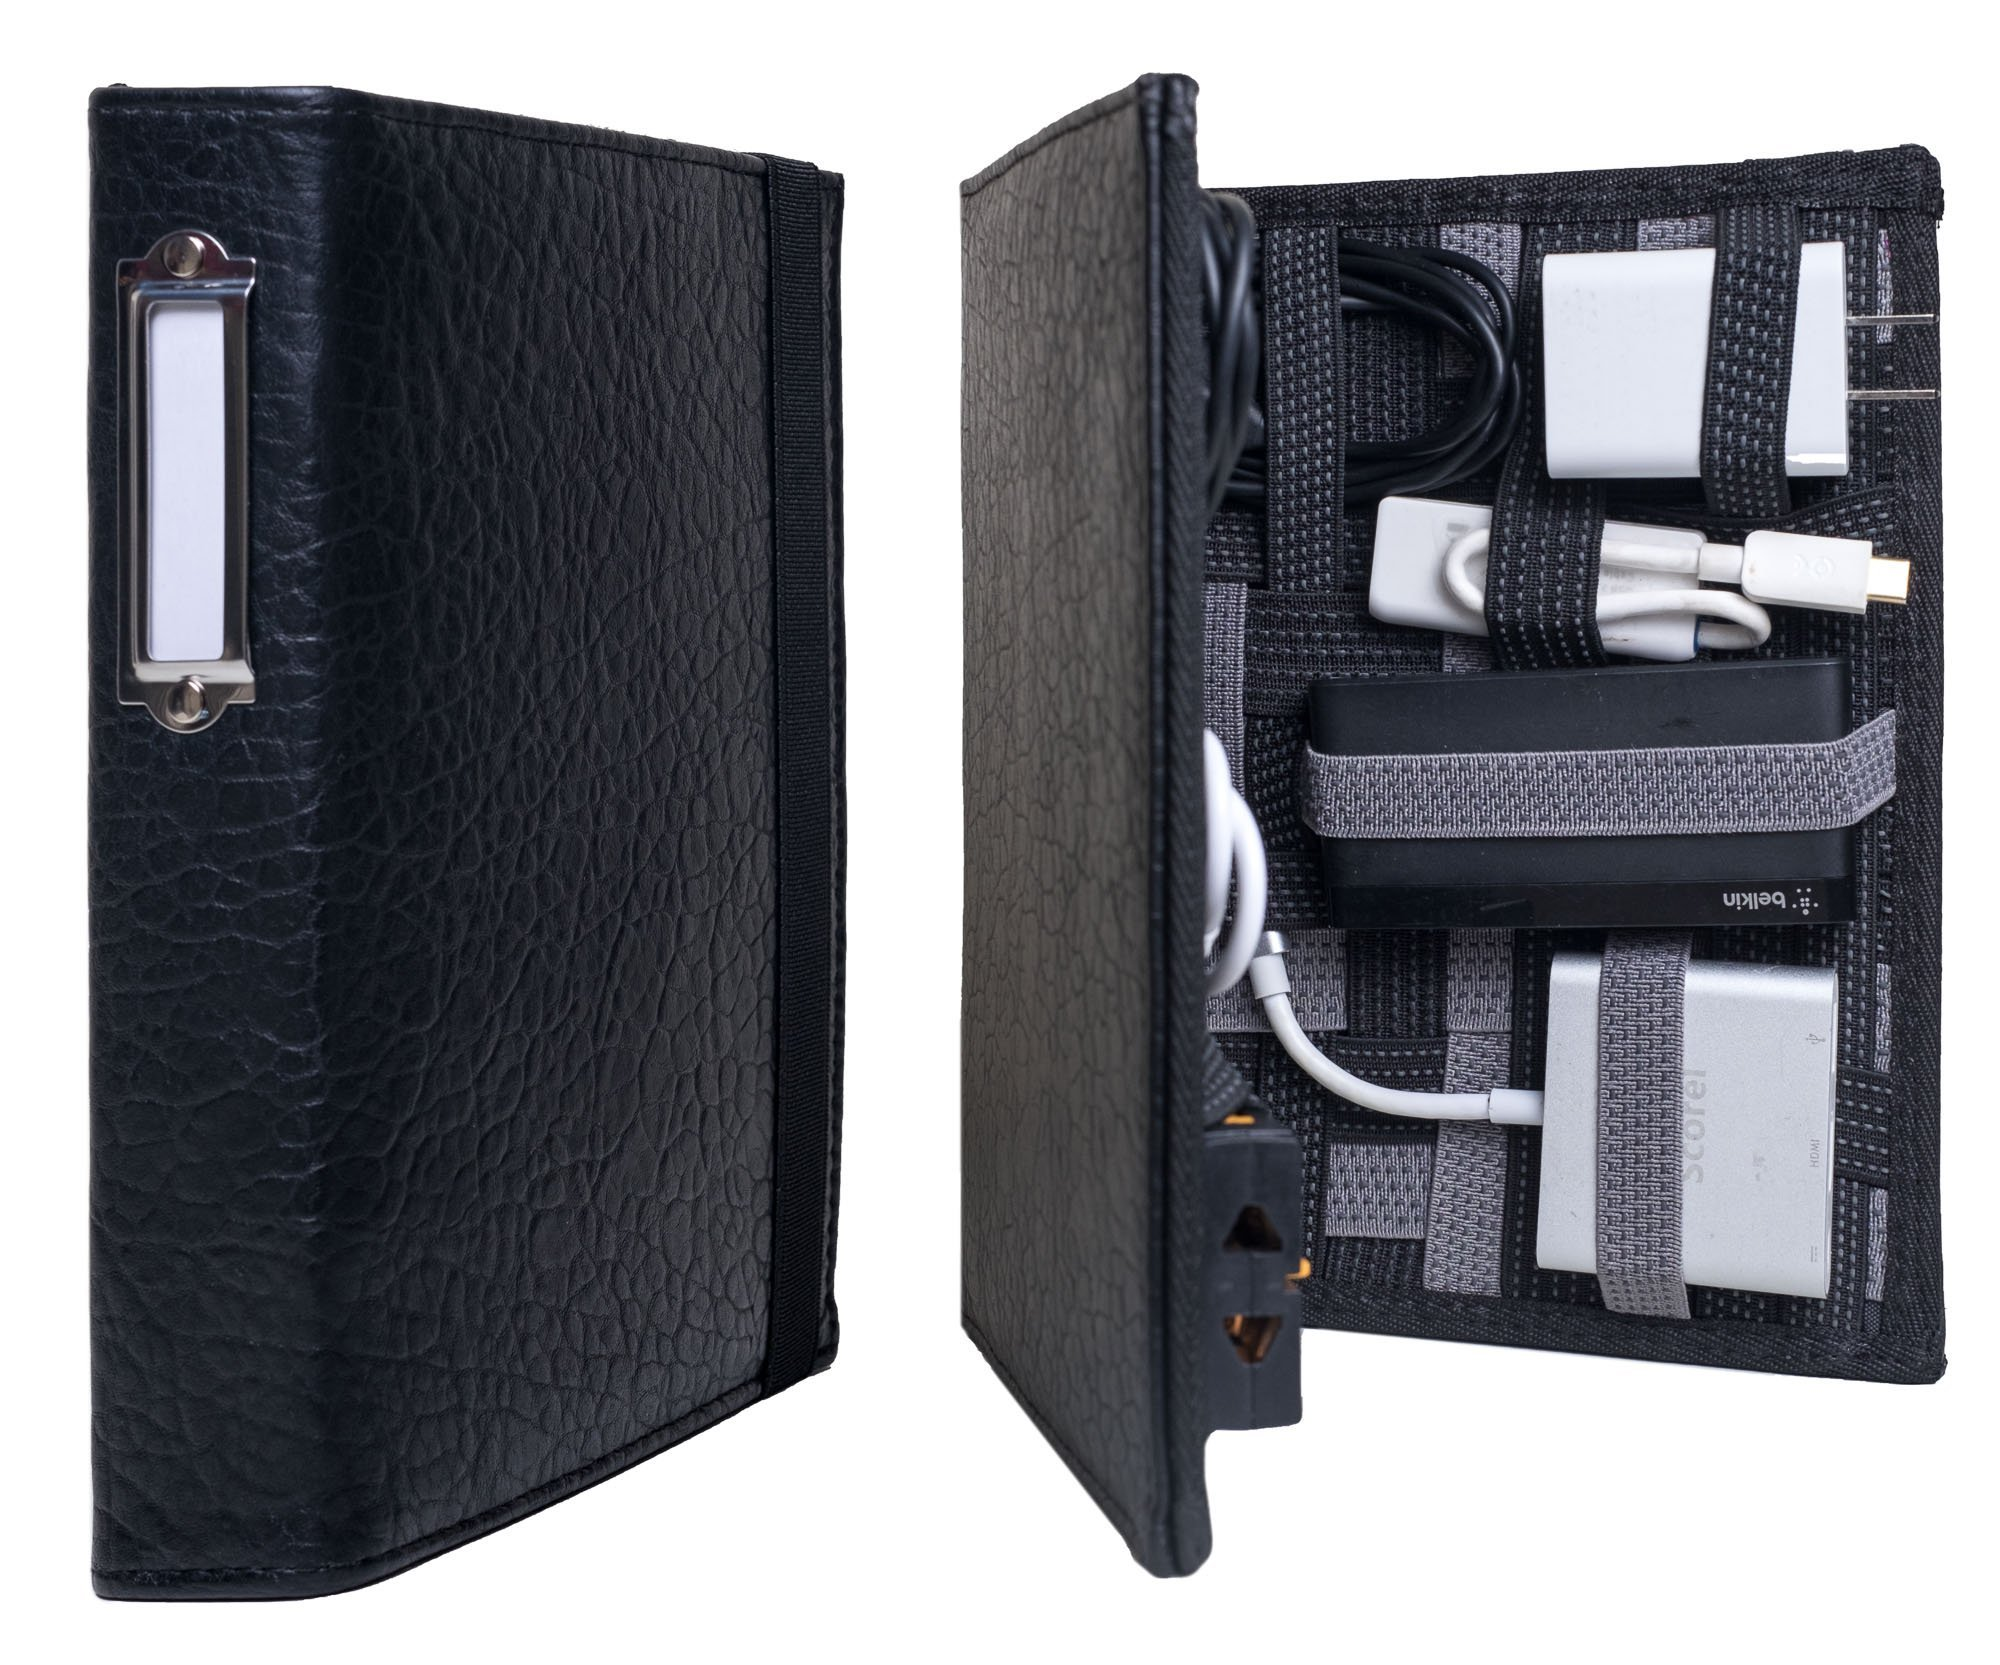 Strapbook Executive - Leather Multipurpose Elastic Grid Book Organizer